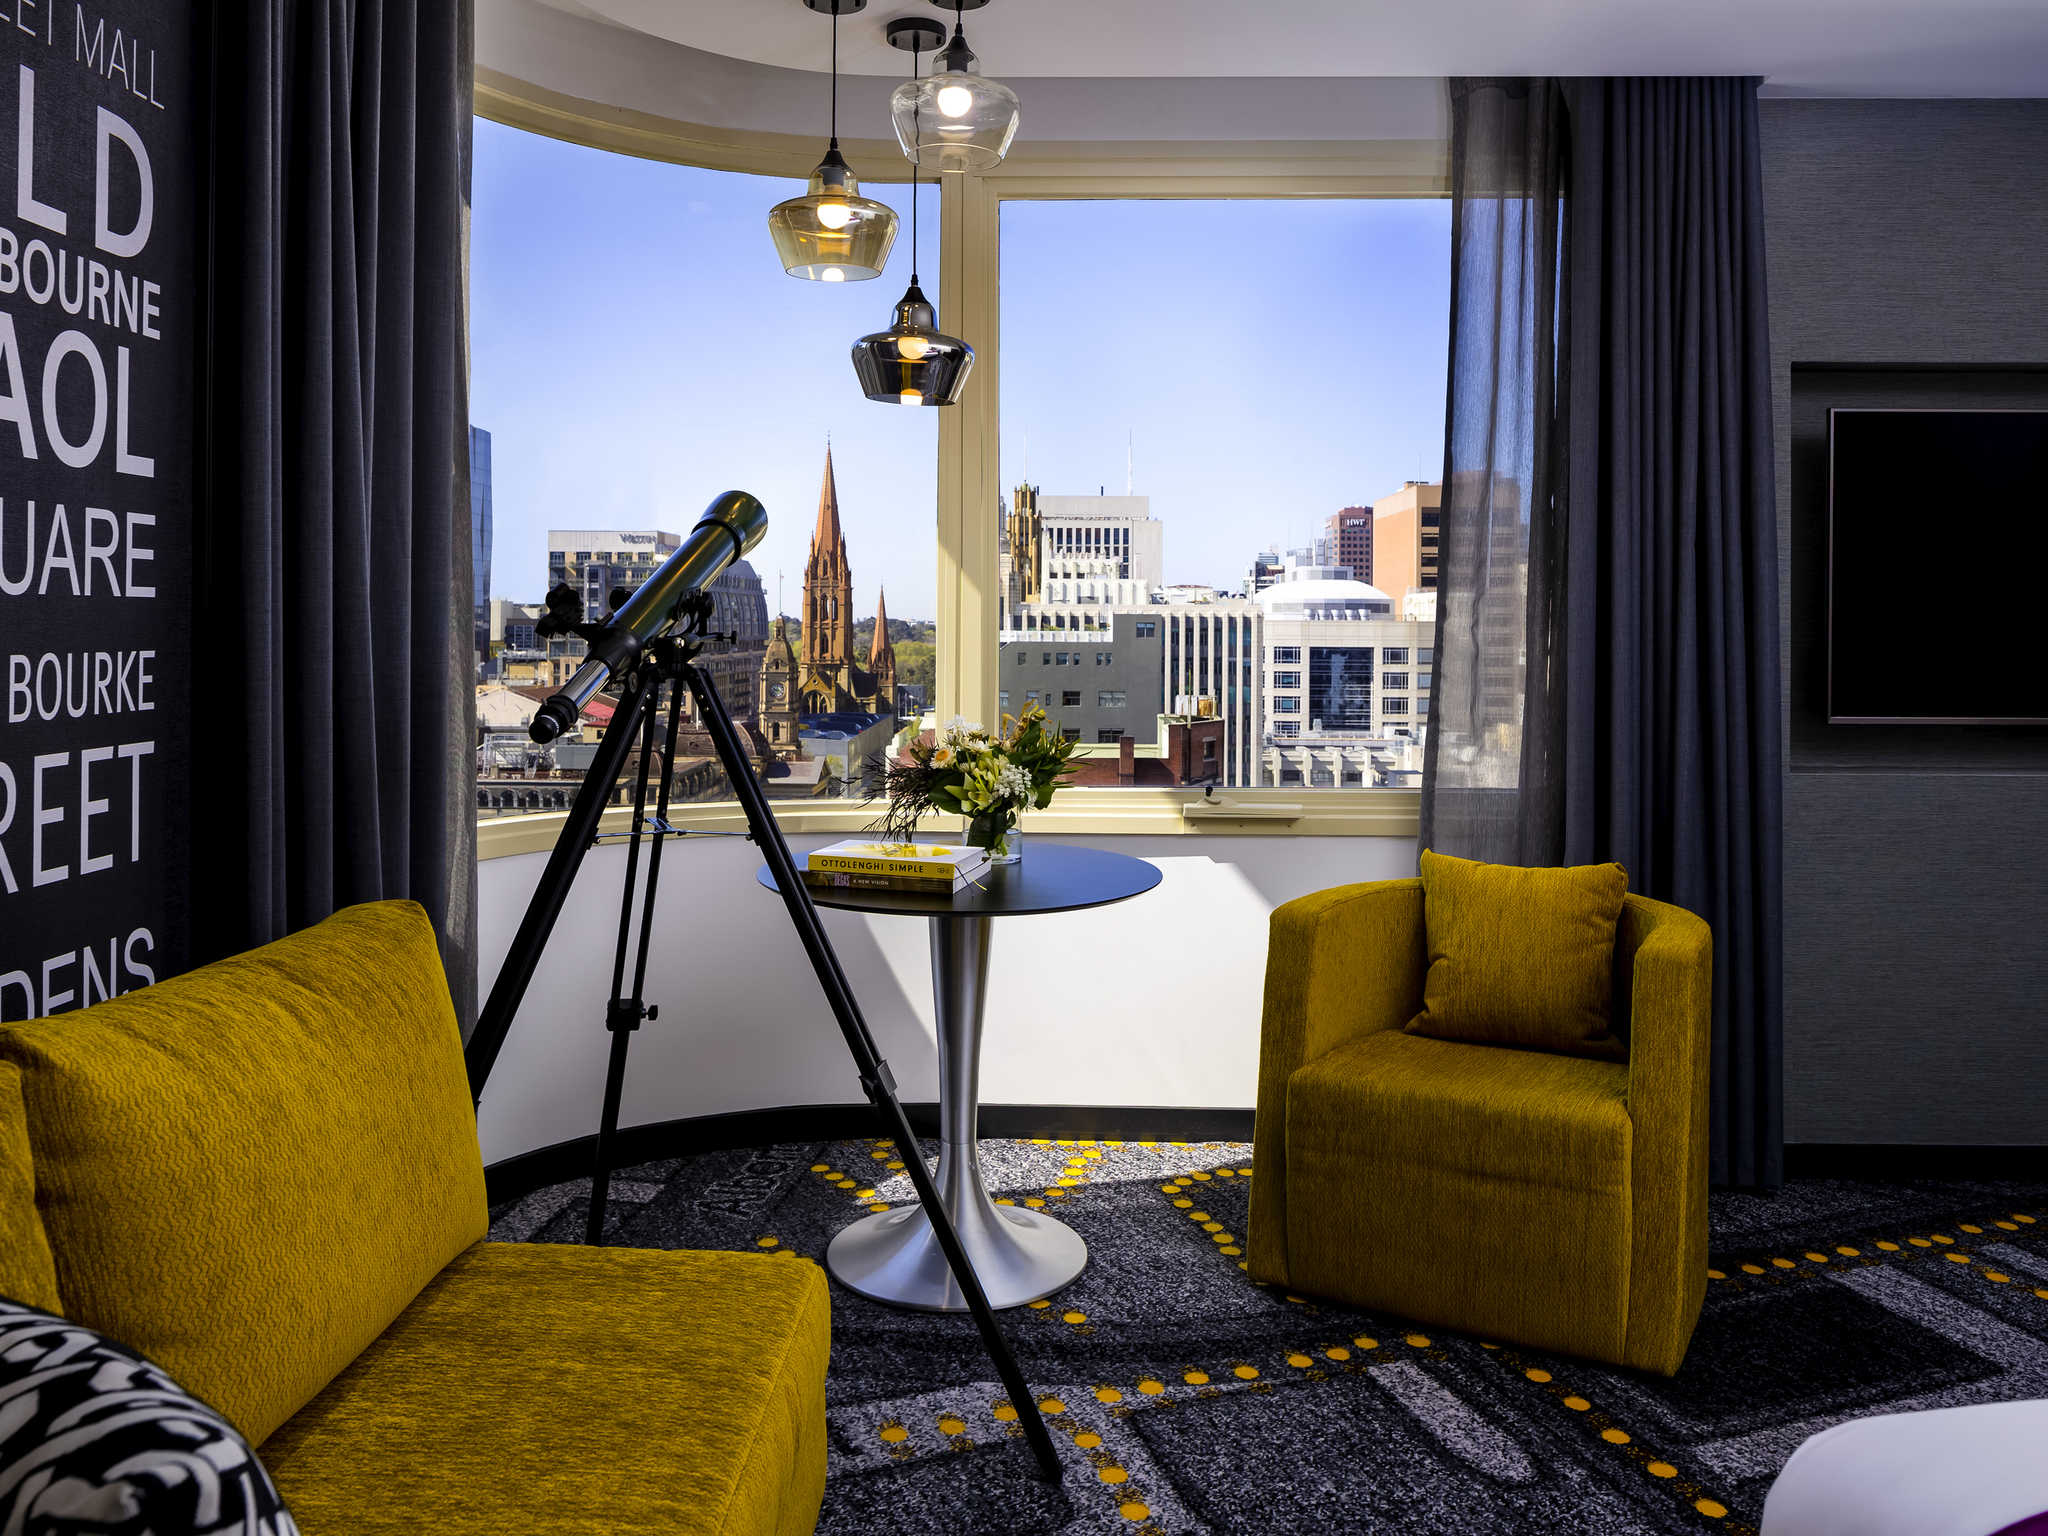 Hotel - The Swanston Hotel Melbourne Grand Mercure